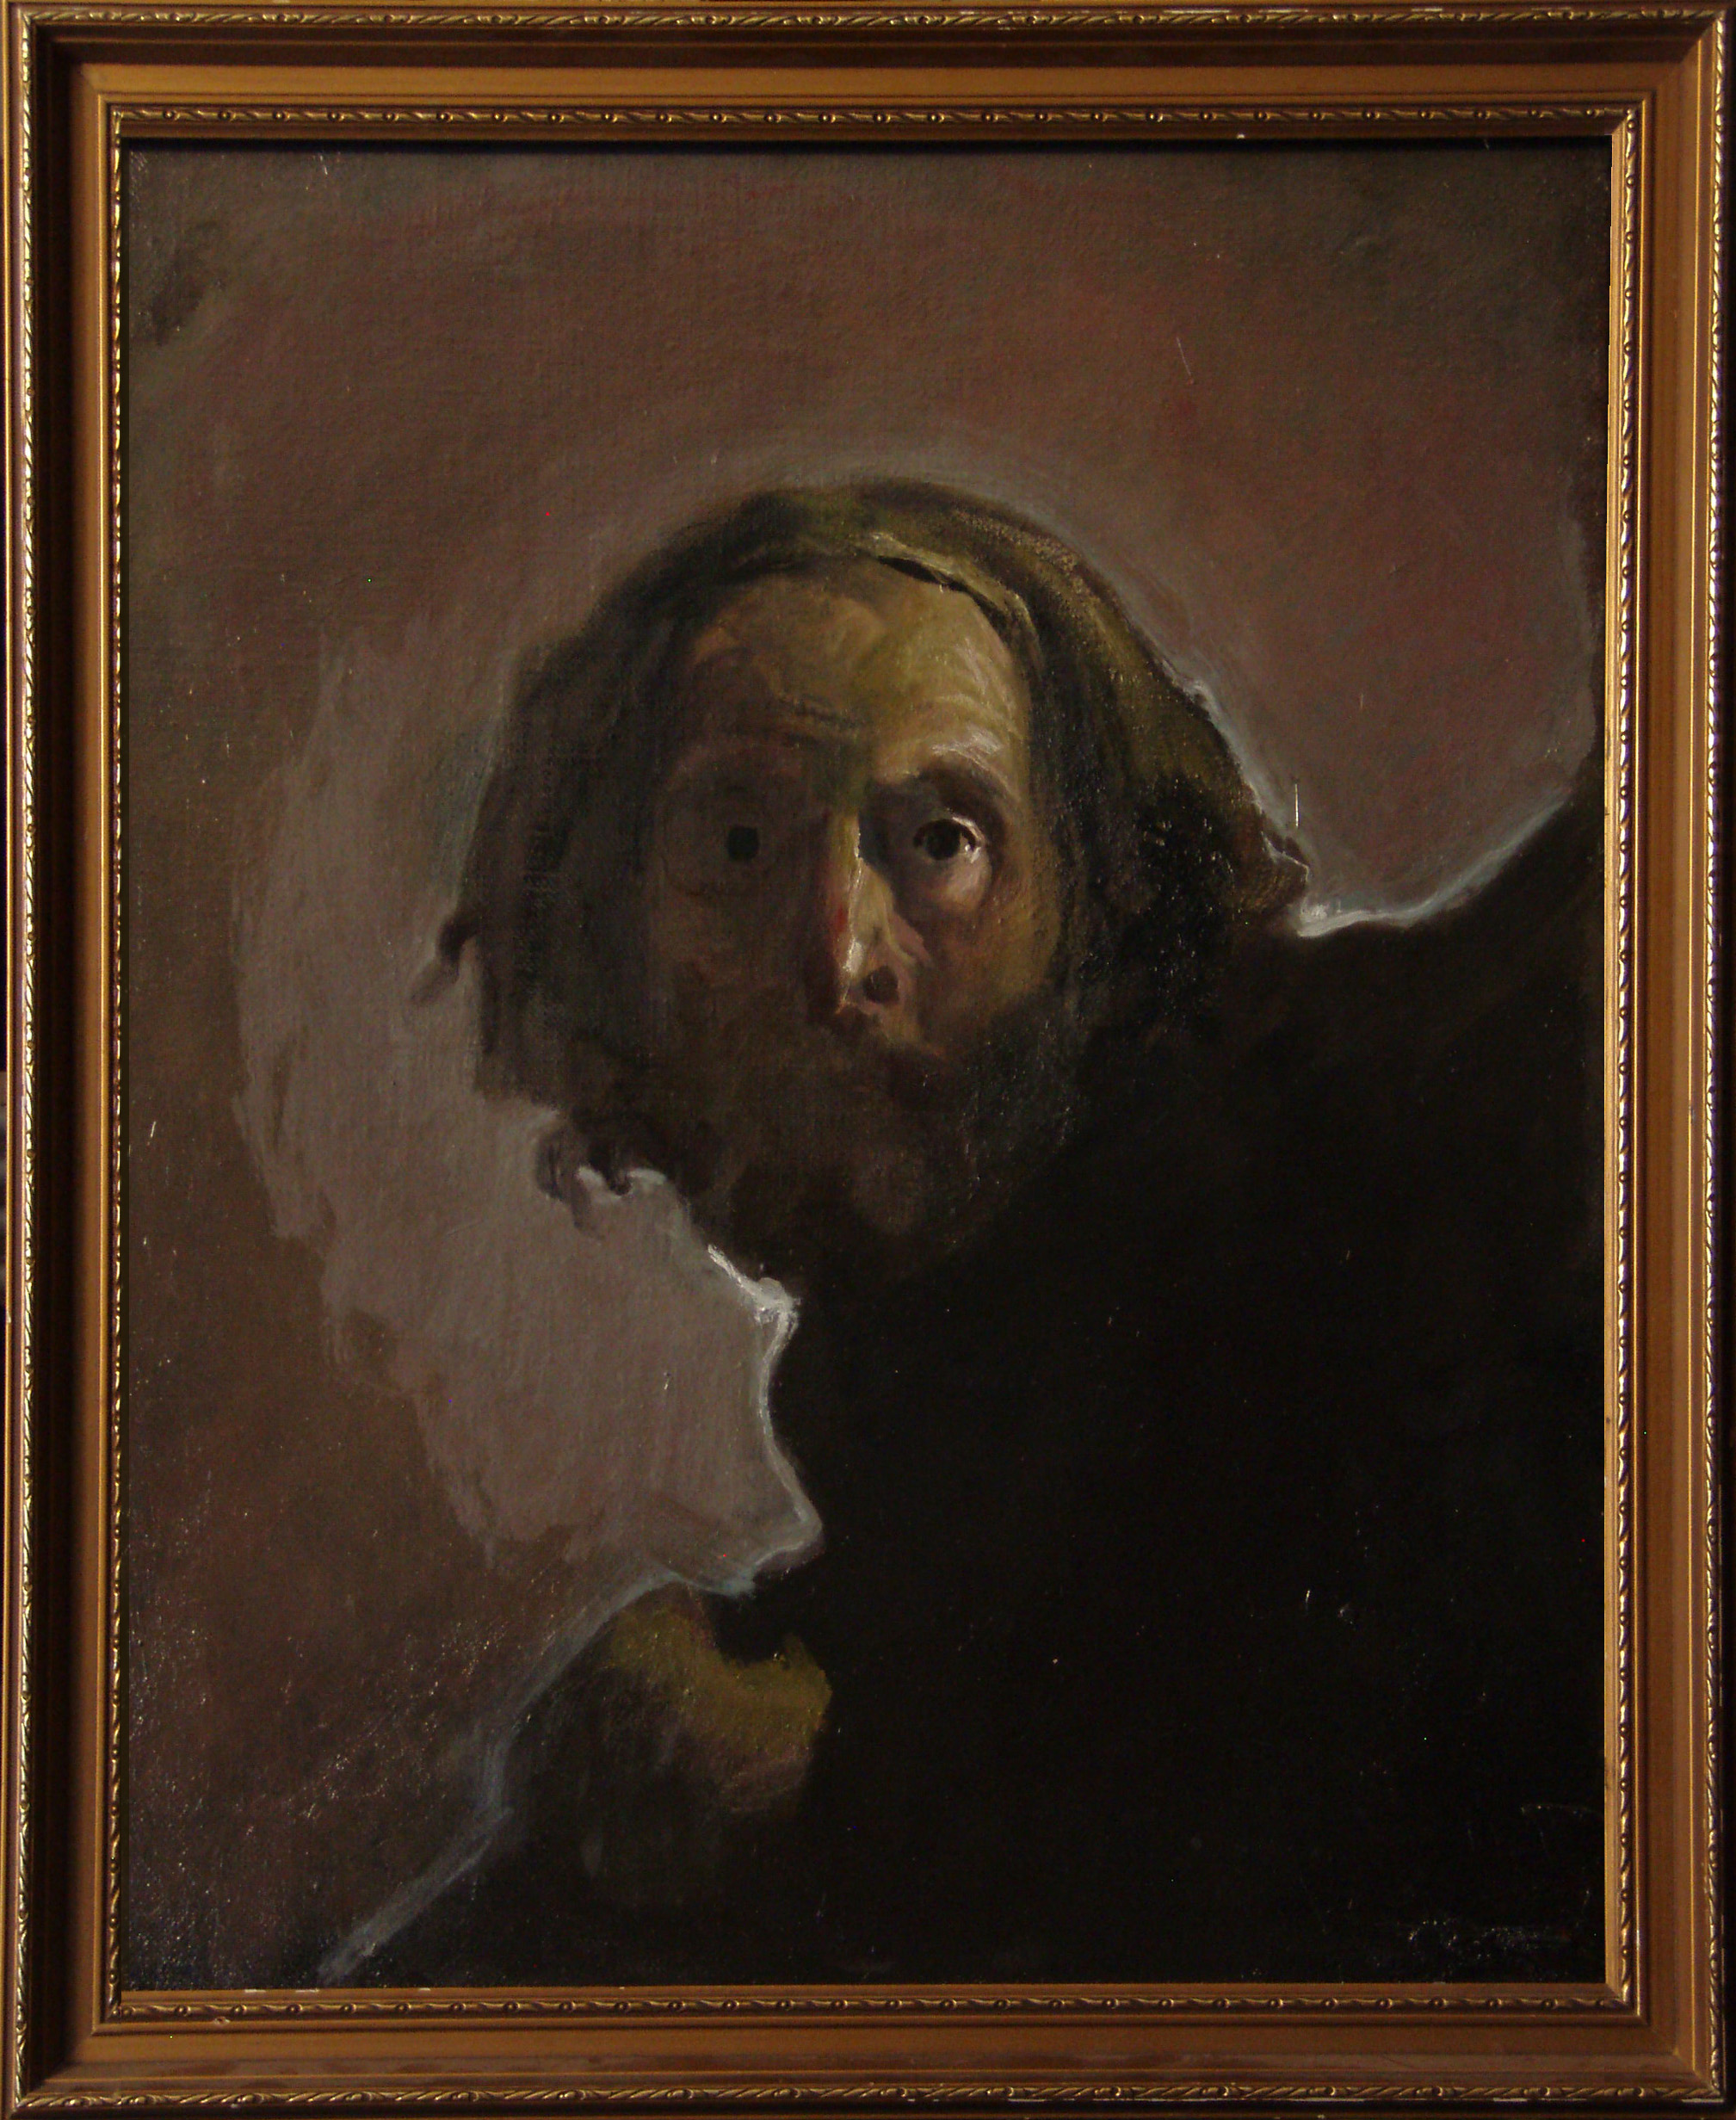 Self portrait, 50x60cm, 2016